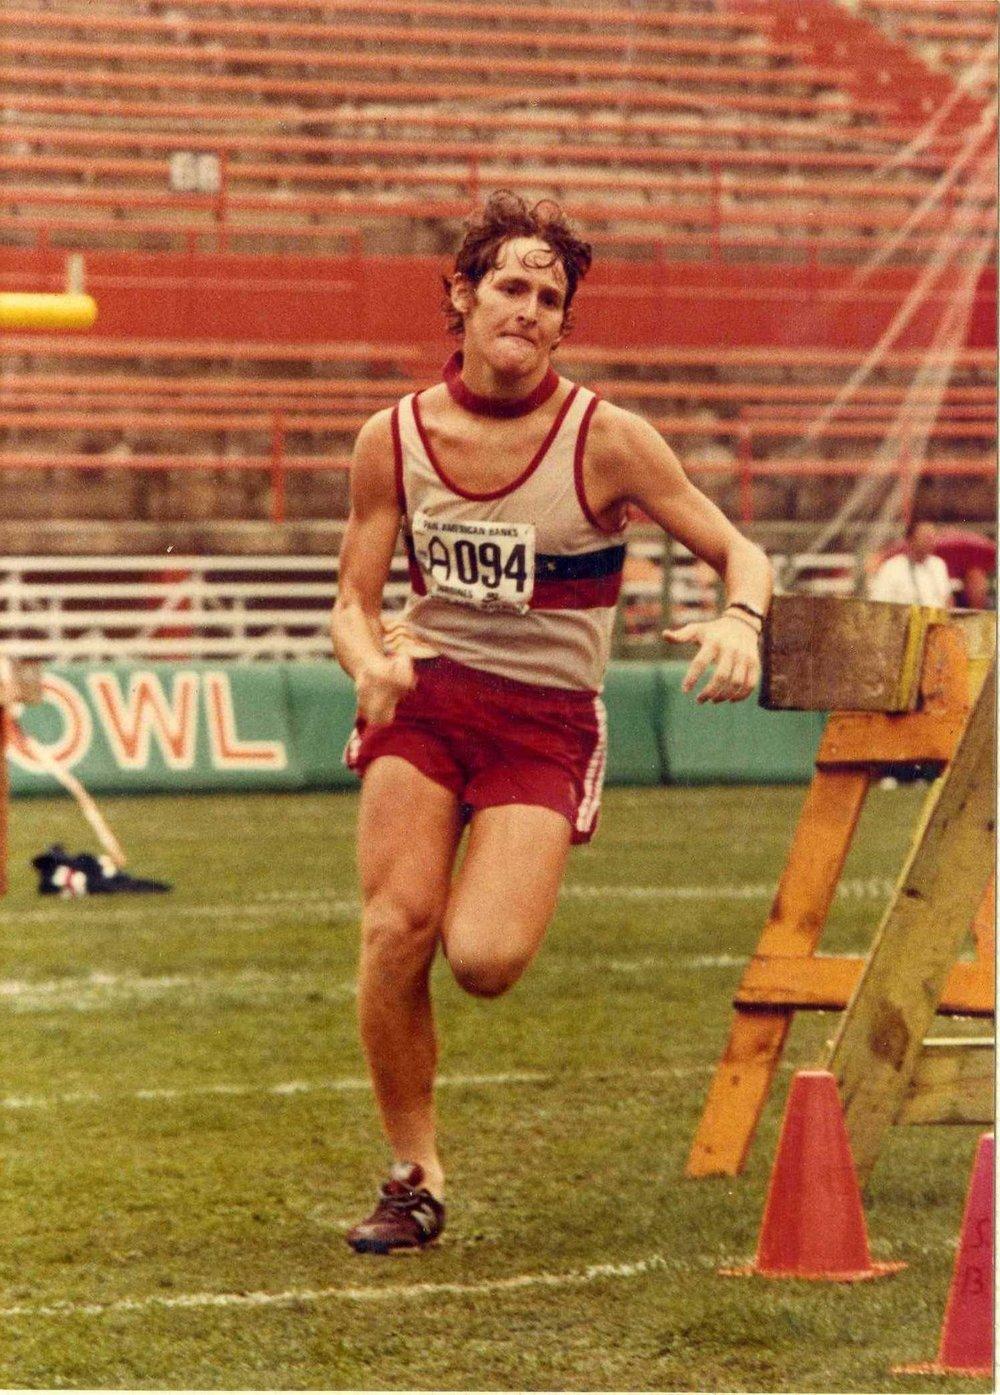 First Marathon, Orange Bowl 1983, 17 years old